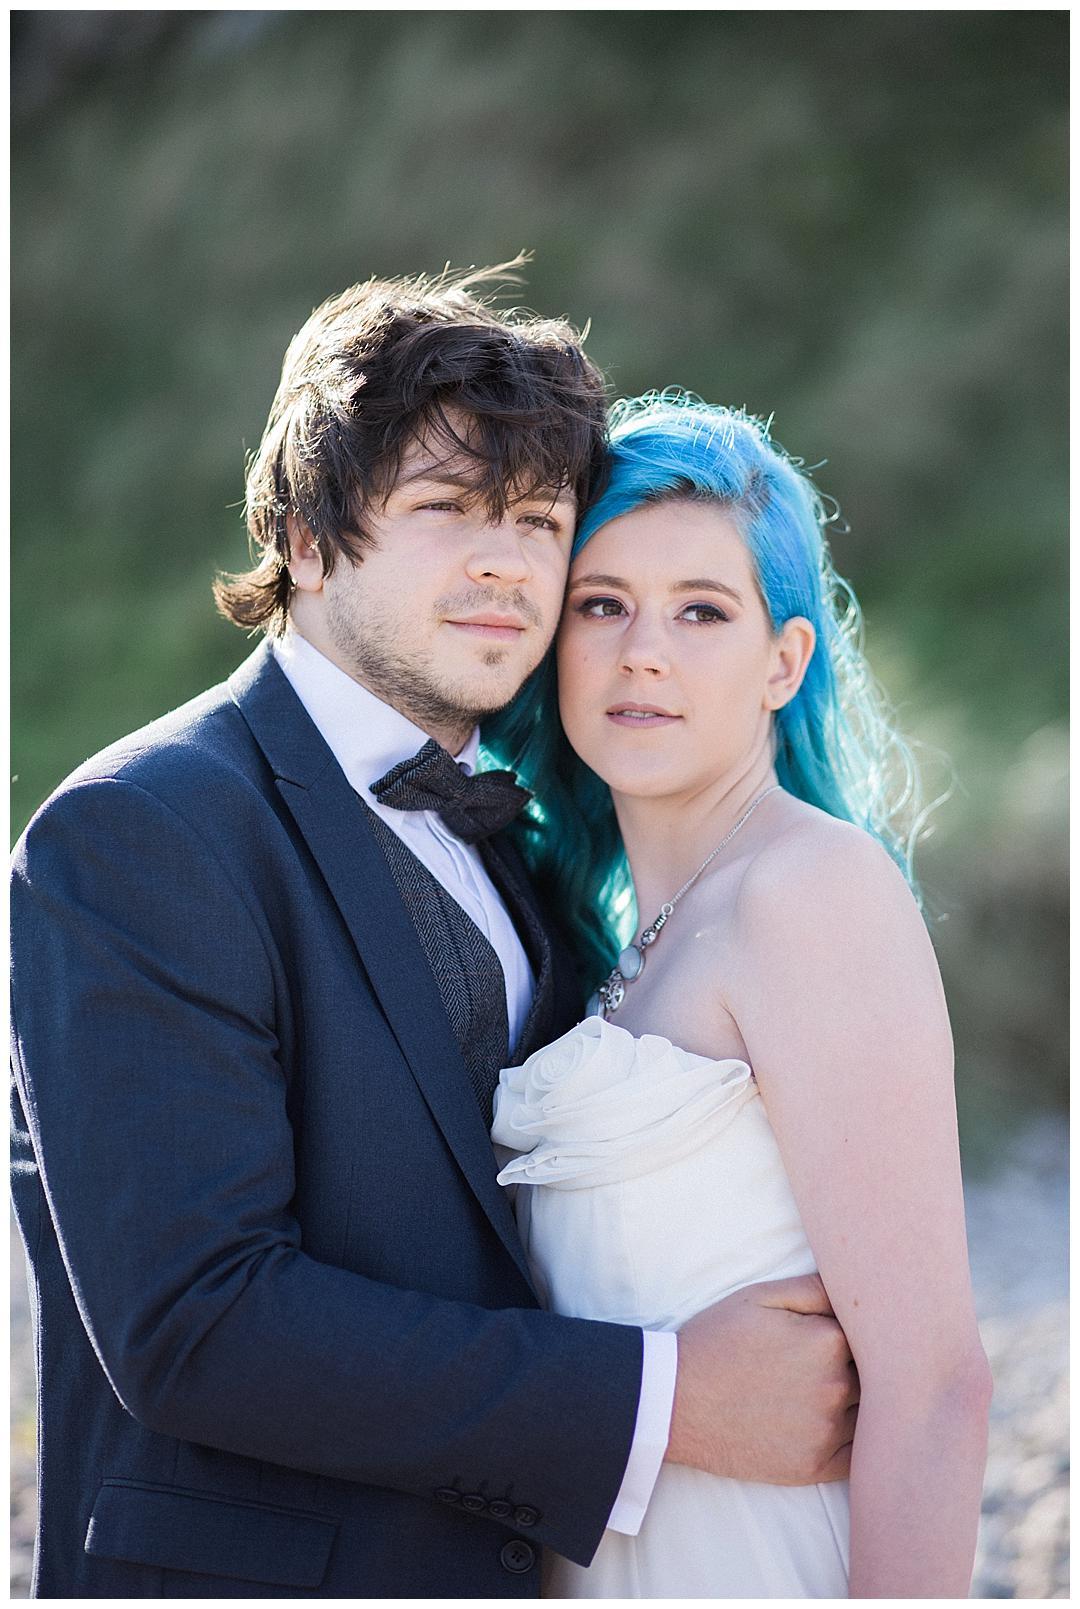 We_can _be_Heroes_alternative_wedding_photographer_Ireland_0068